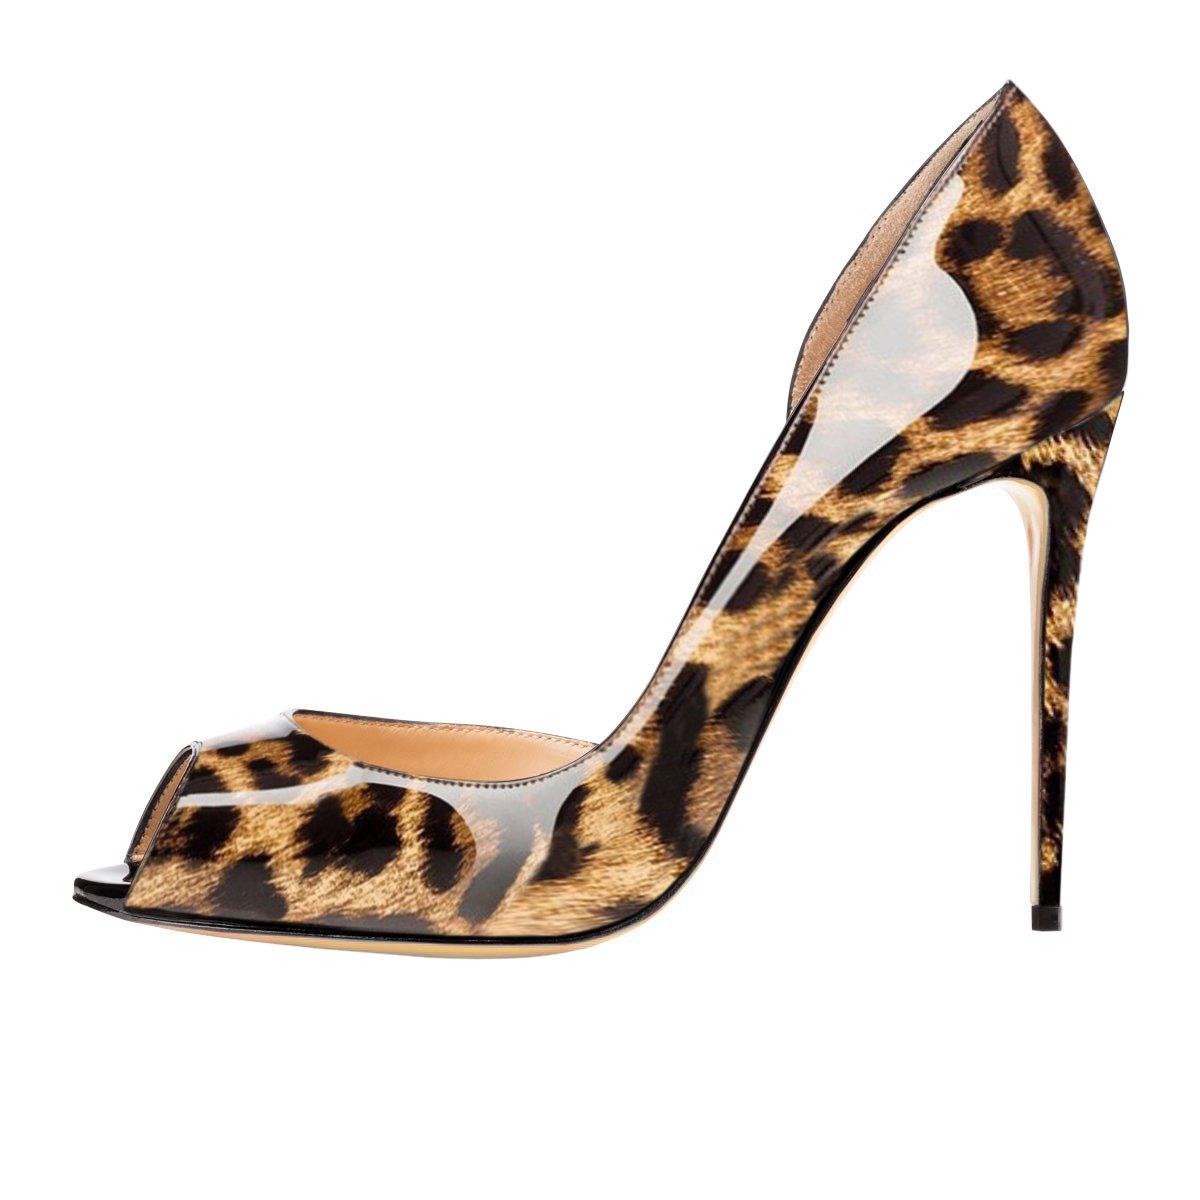 Chris-T Women Fashion D'Orsay Peep Toe with High Heel Stiletto Dress Party Pumps Size 5-15 US B078HP8JM9 13 B(M) US|Leopard/Red S0le(bottom)